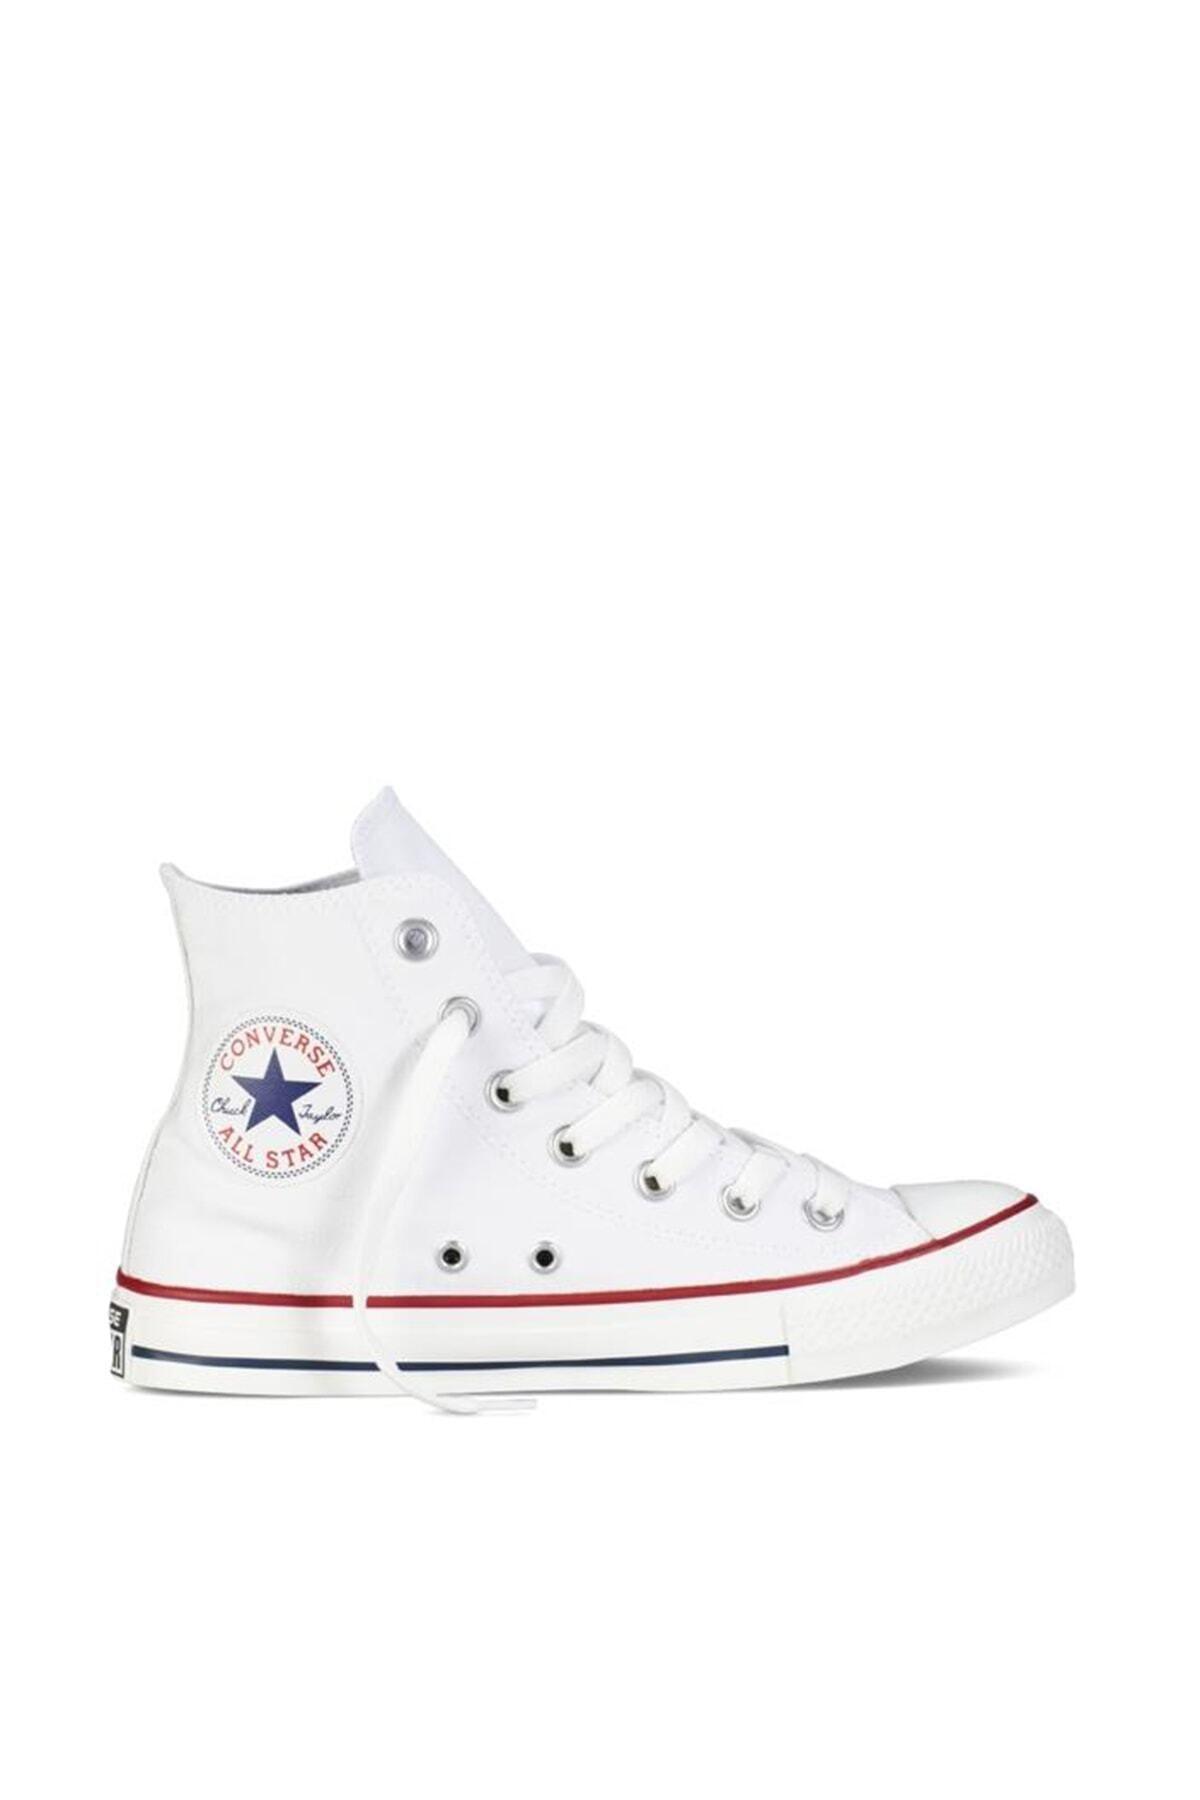 converse Unisex Beyaz Sneaker Chuck Taylor Allstar - M7650c M7650c 2